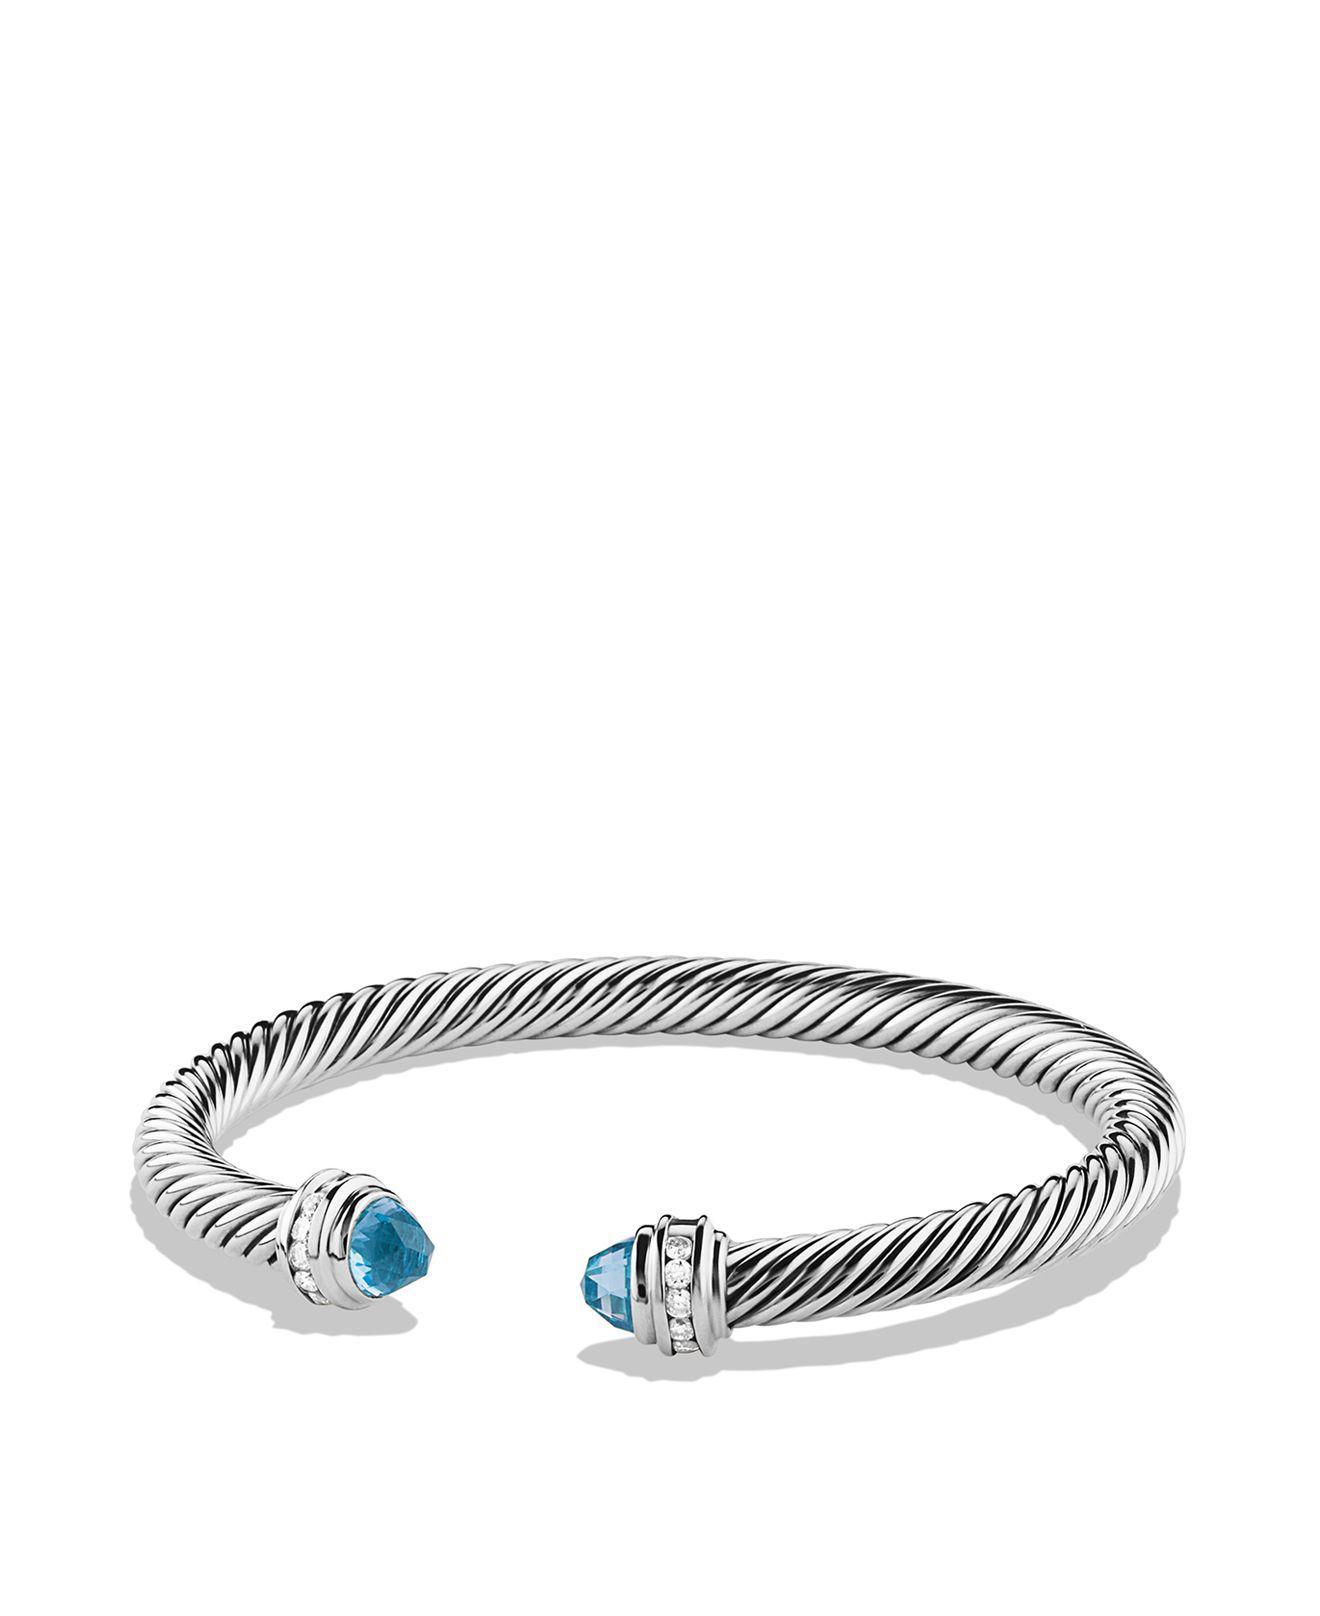 David Yurman Cable Classics onyx and diamond cuff bracelet - Metallic Kabi59U